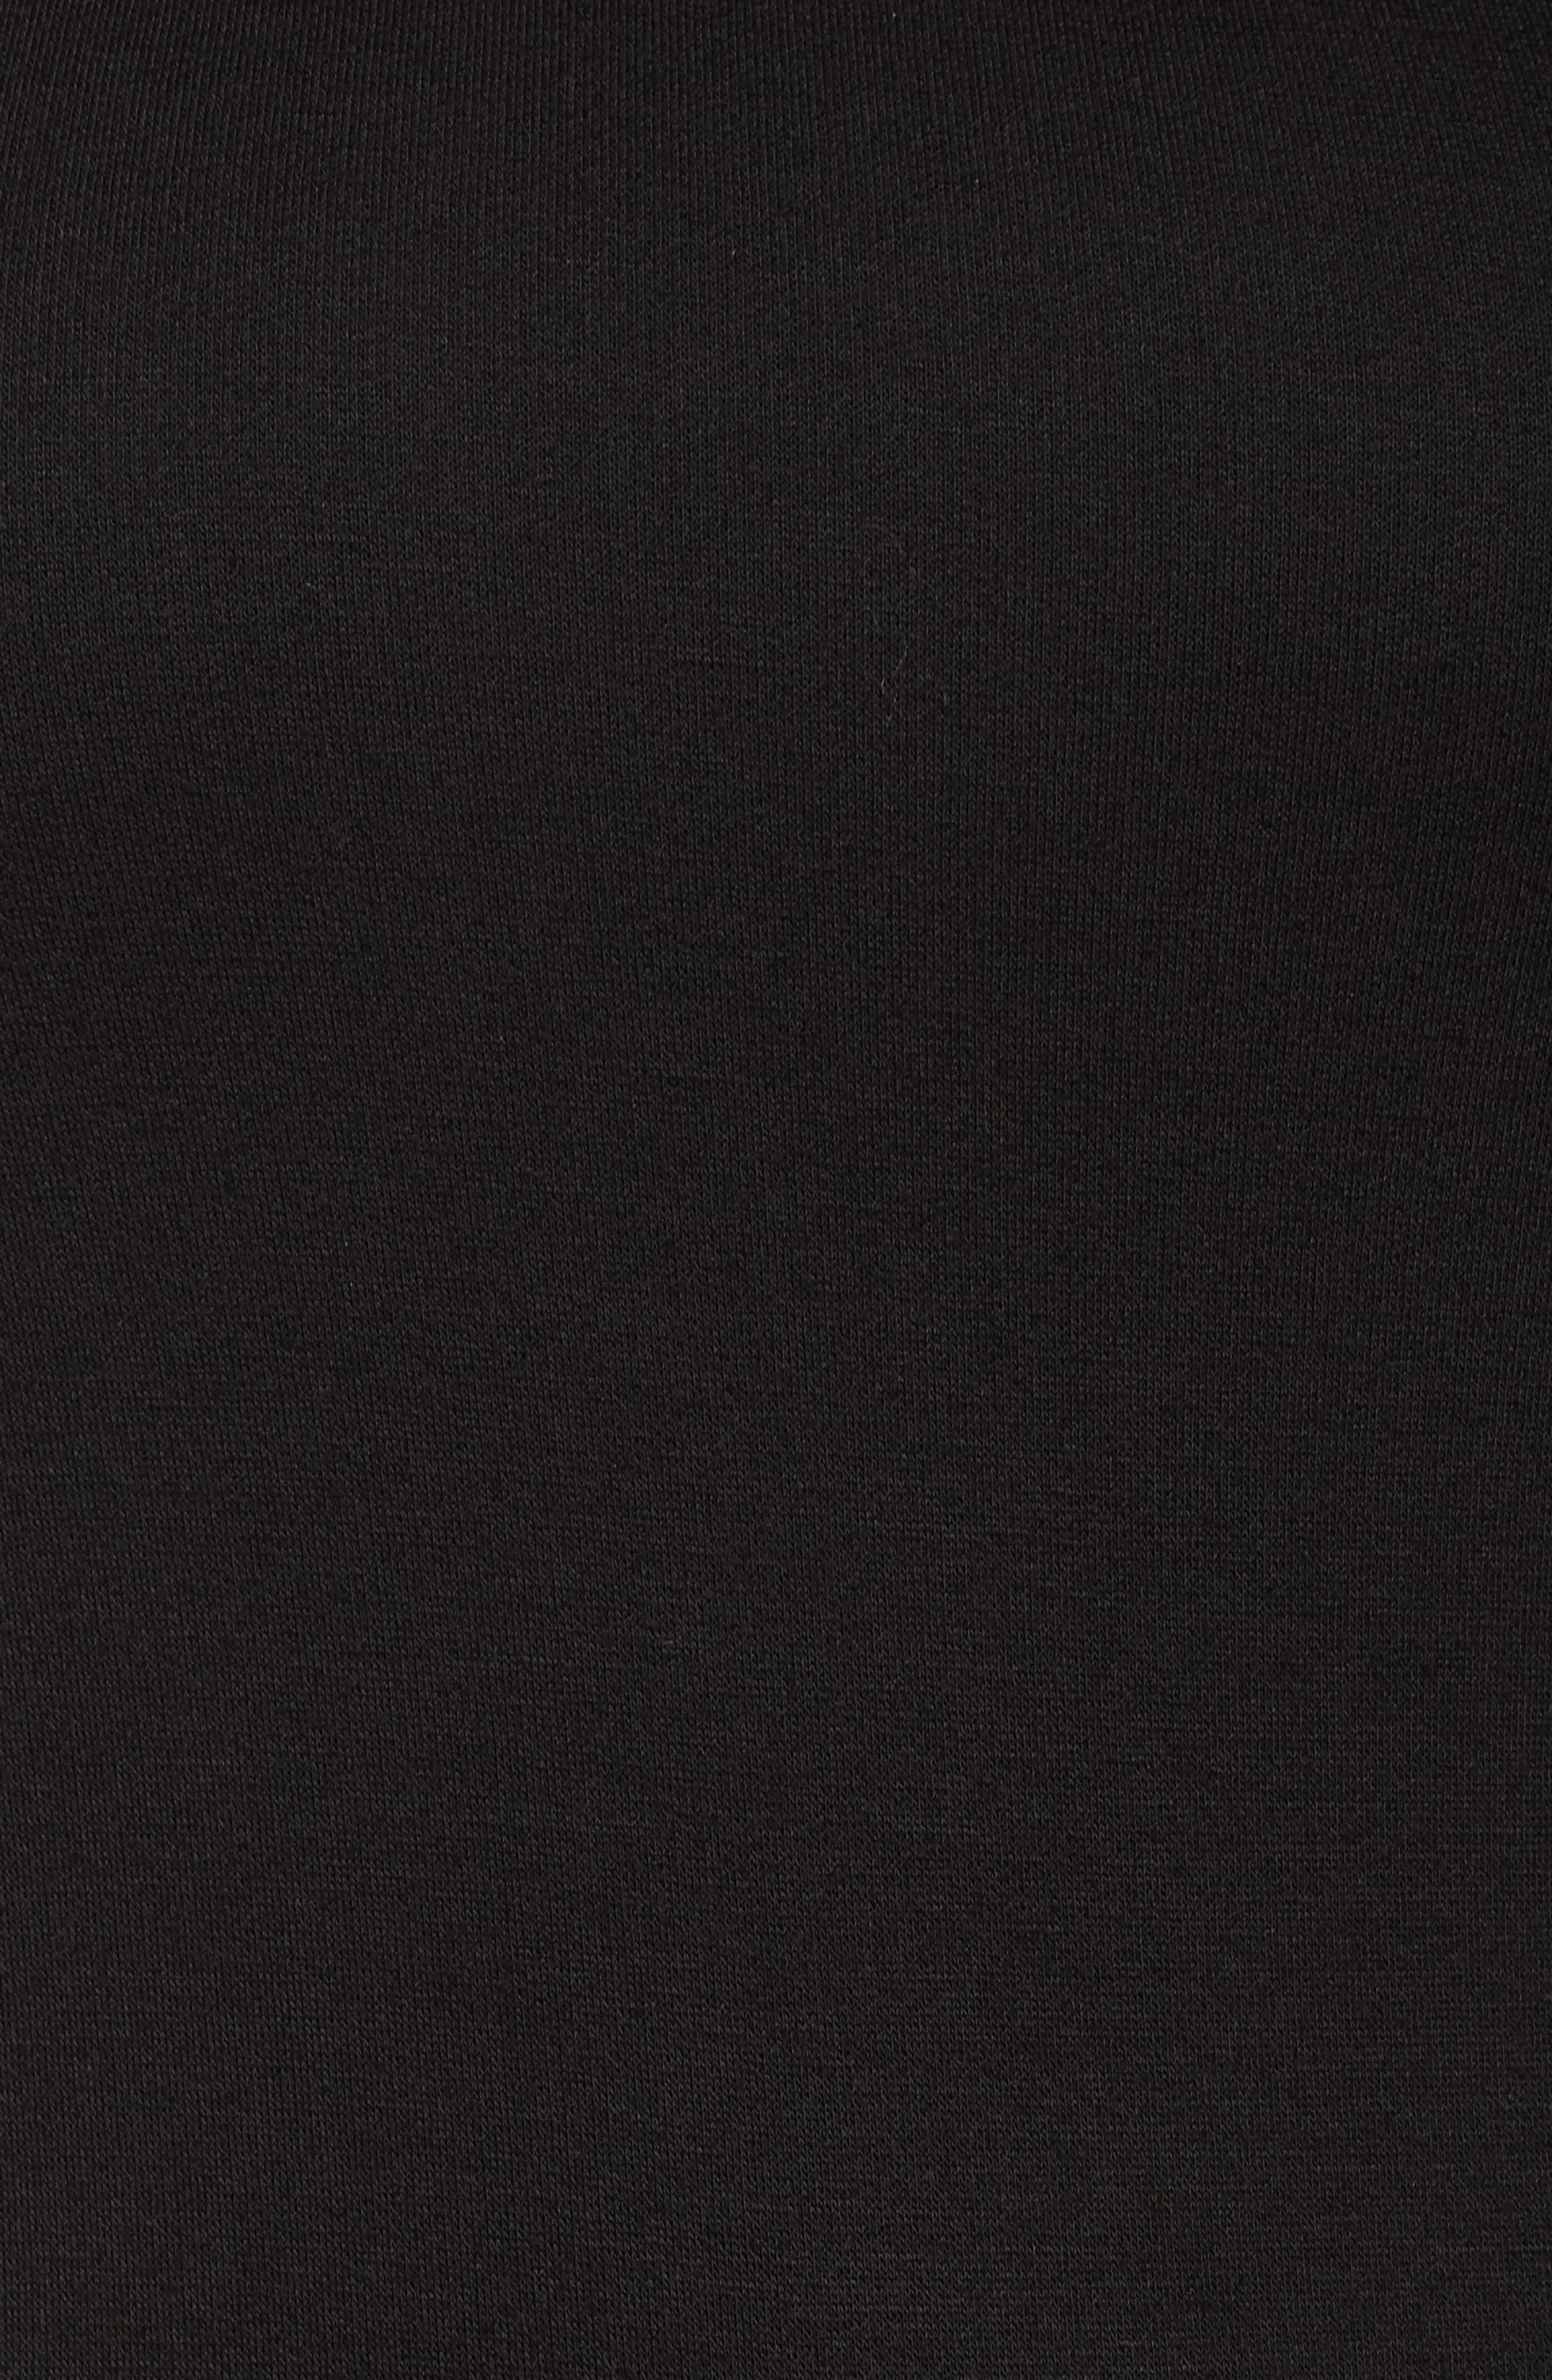 Blouson Sleeve Top,                             Alternate thumbnail 5, color,